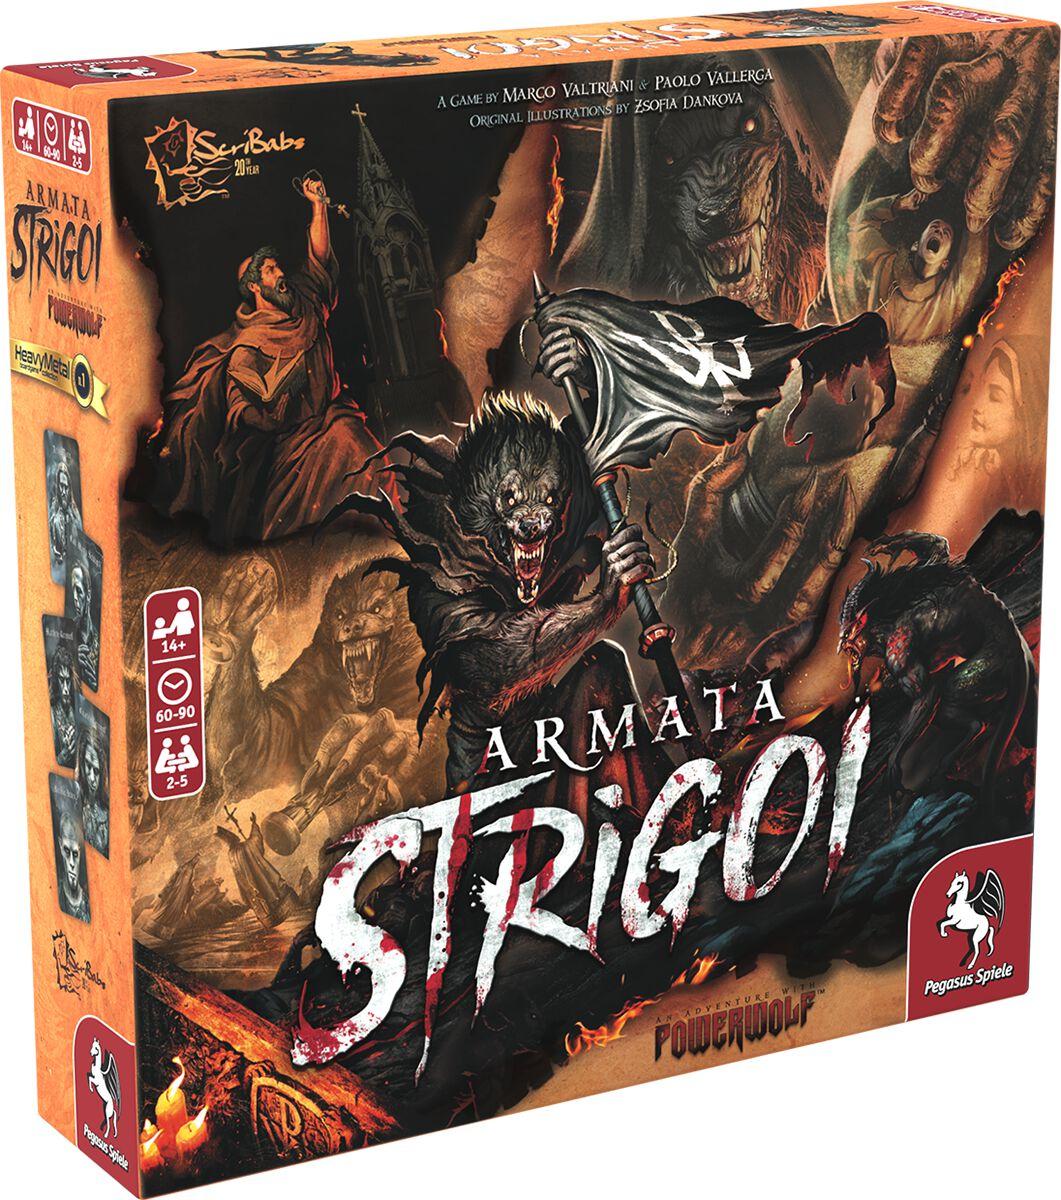 Powerwolf Armata Strigoi Brettspiel multicolor 57700G